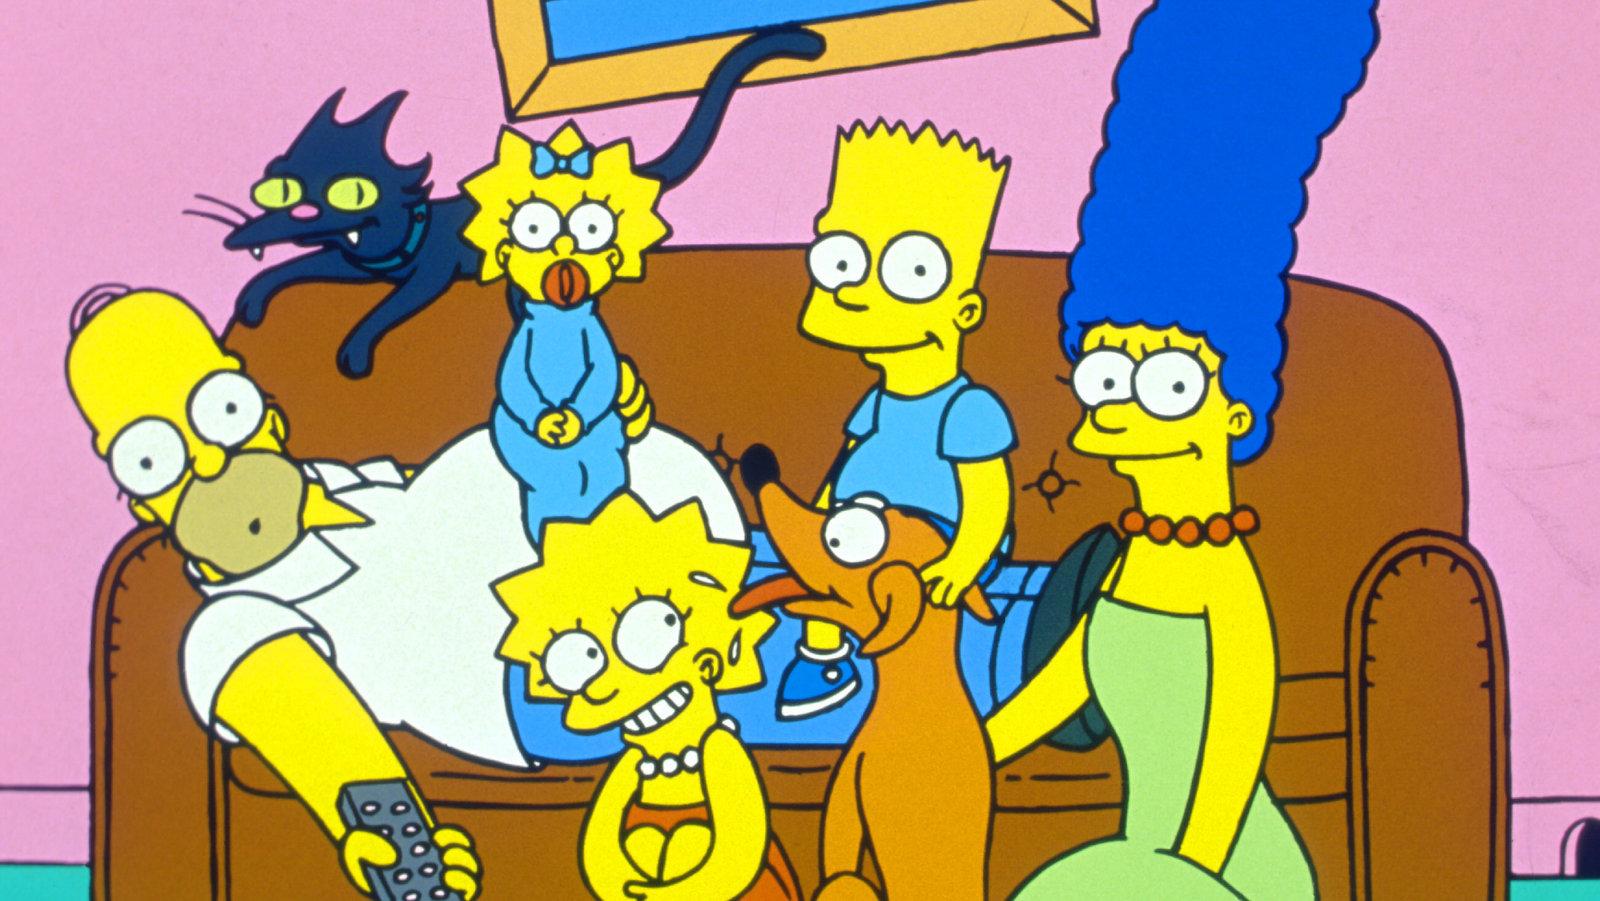 Bart Simpson Drawing Art Graphy Vexel Sketch Bart Simpson